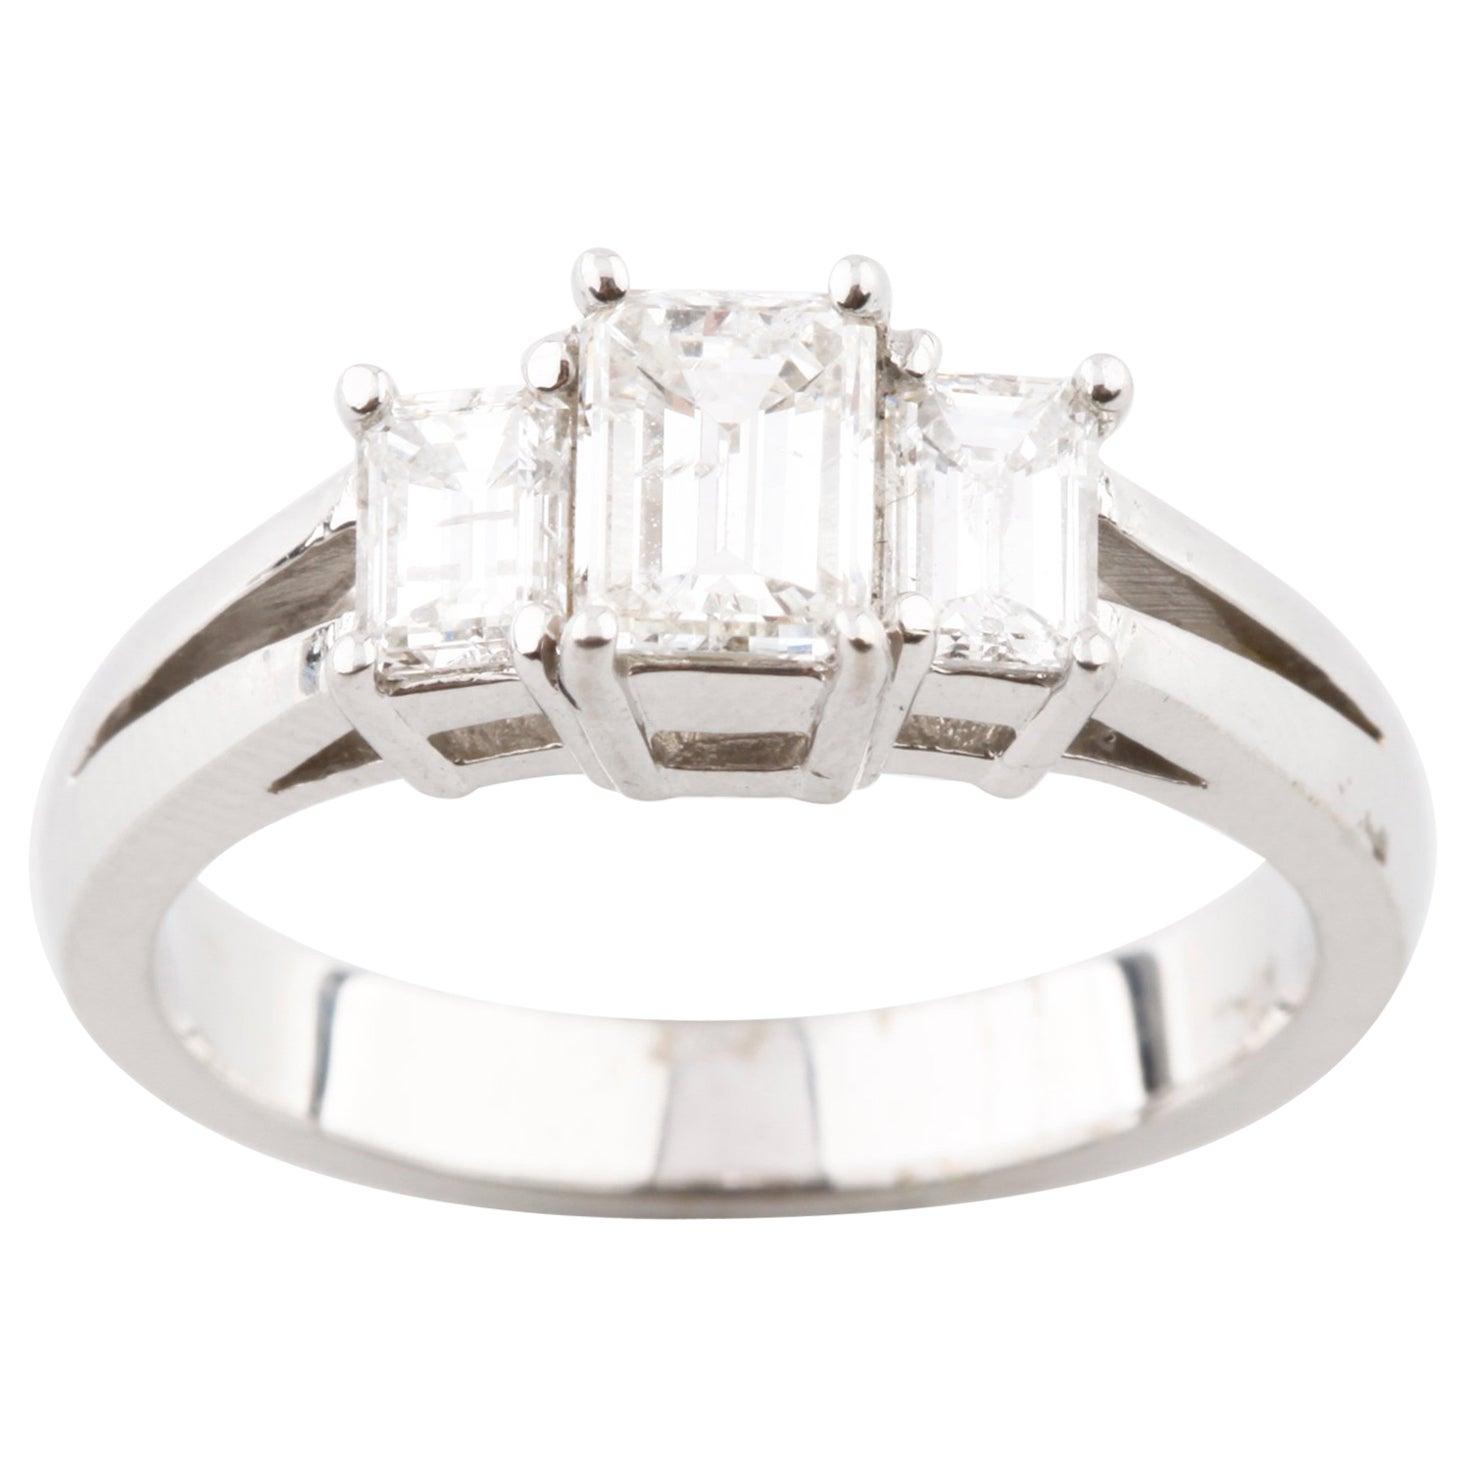 1.36 Carat Emerald Cut 3-Stone Diamond 18 Karat White Gold Engagement Ring